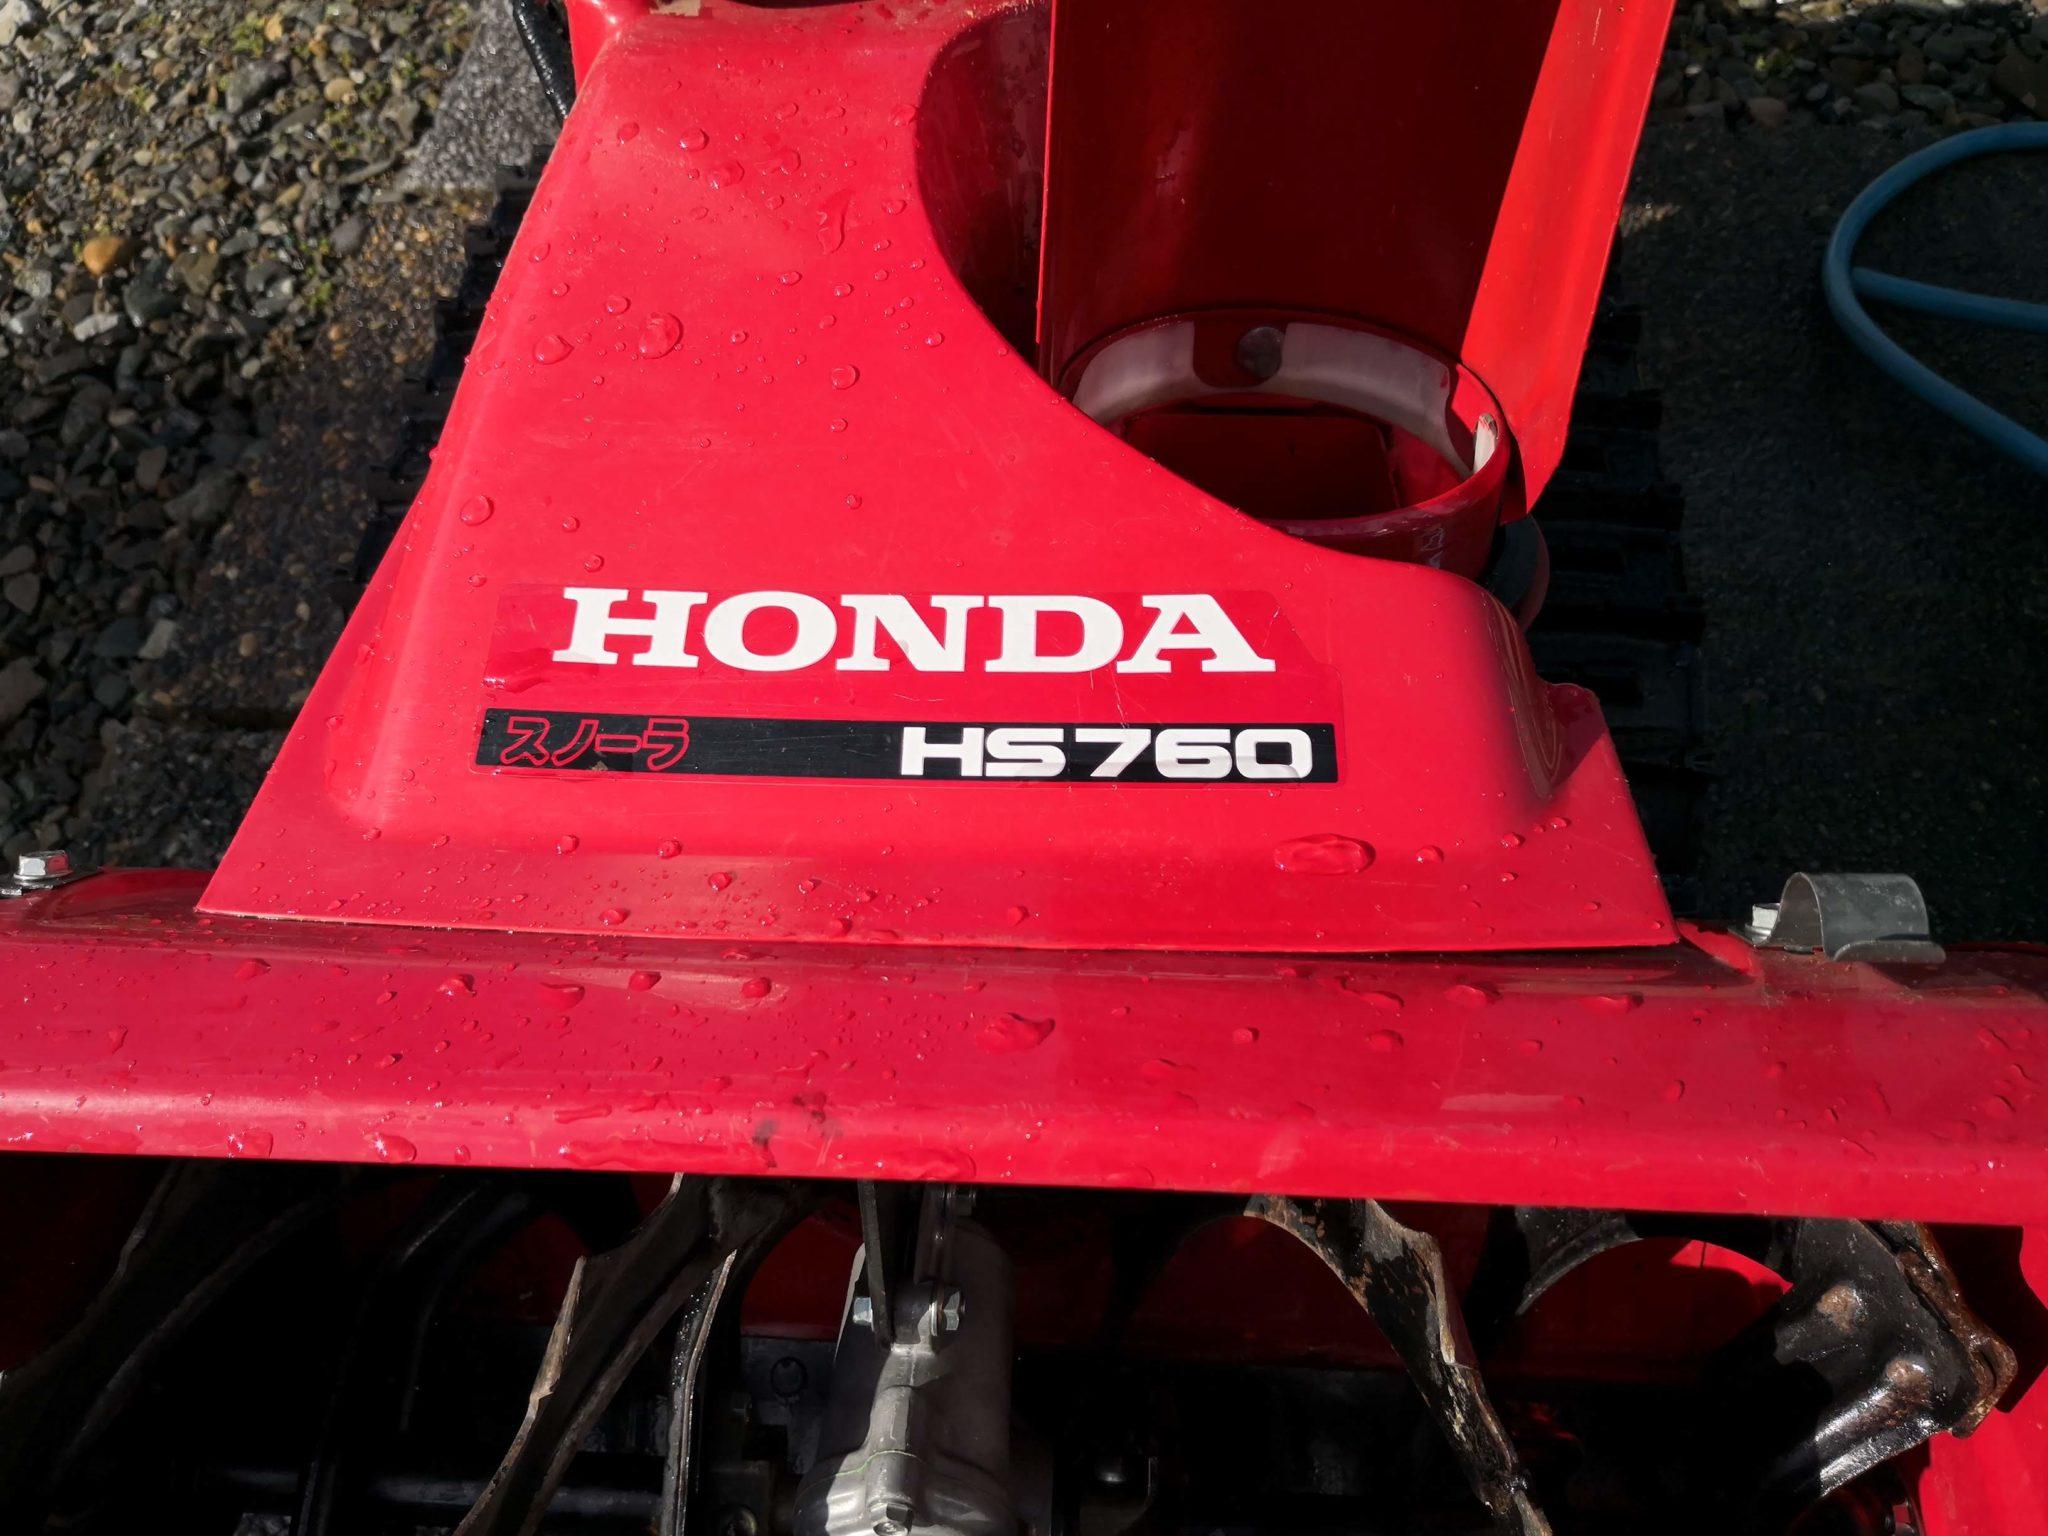 HONDAの除雪機HS760